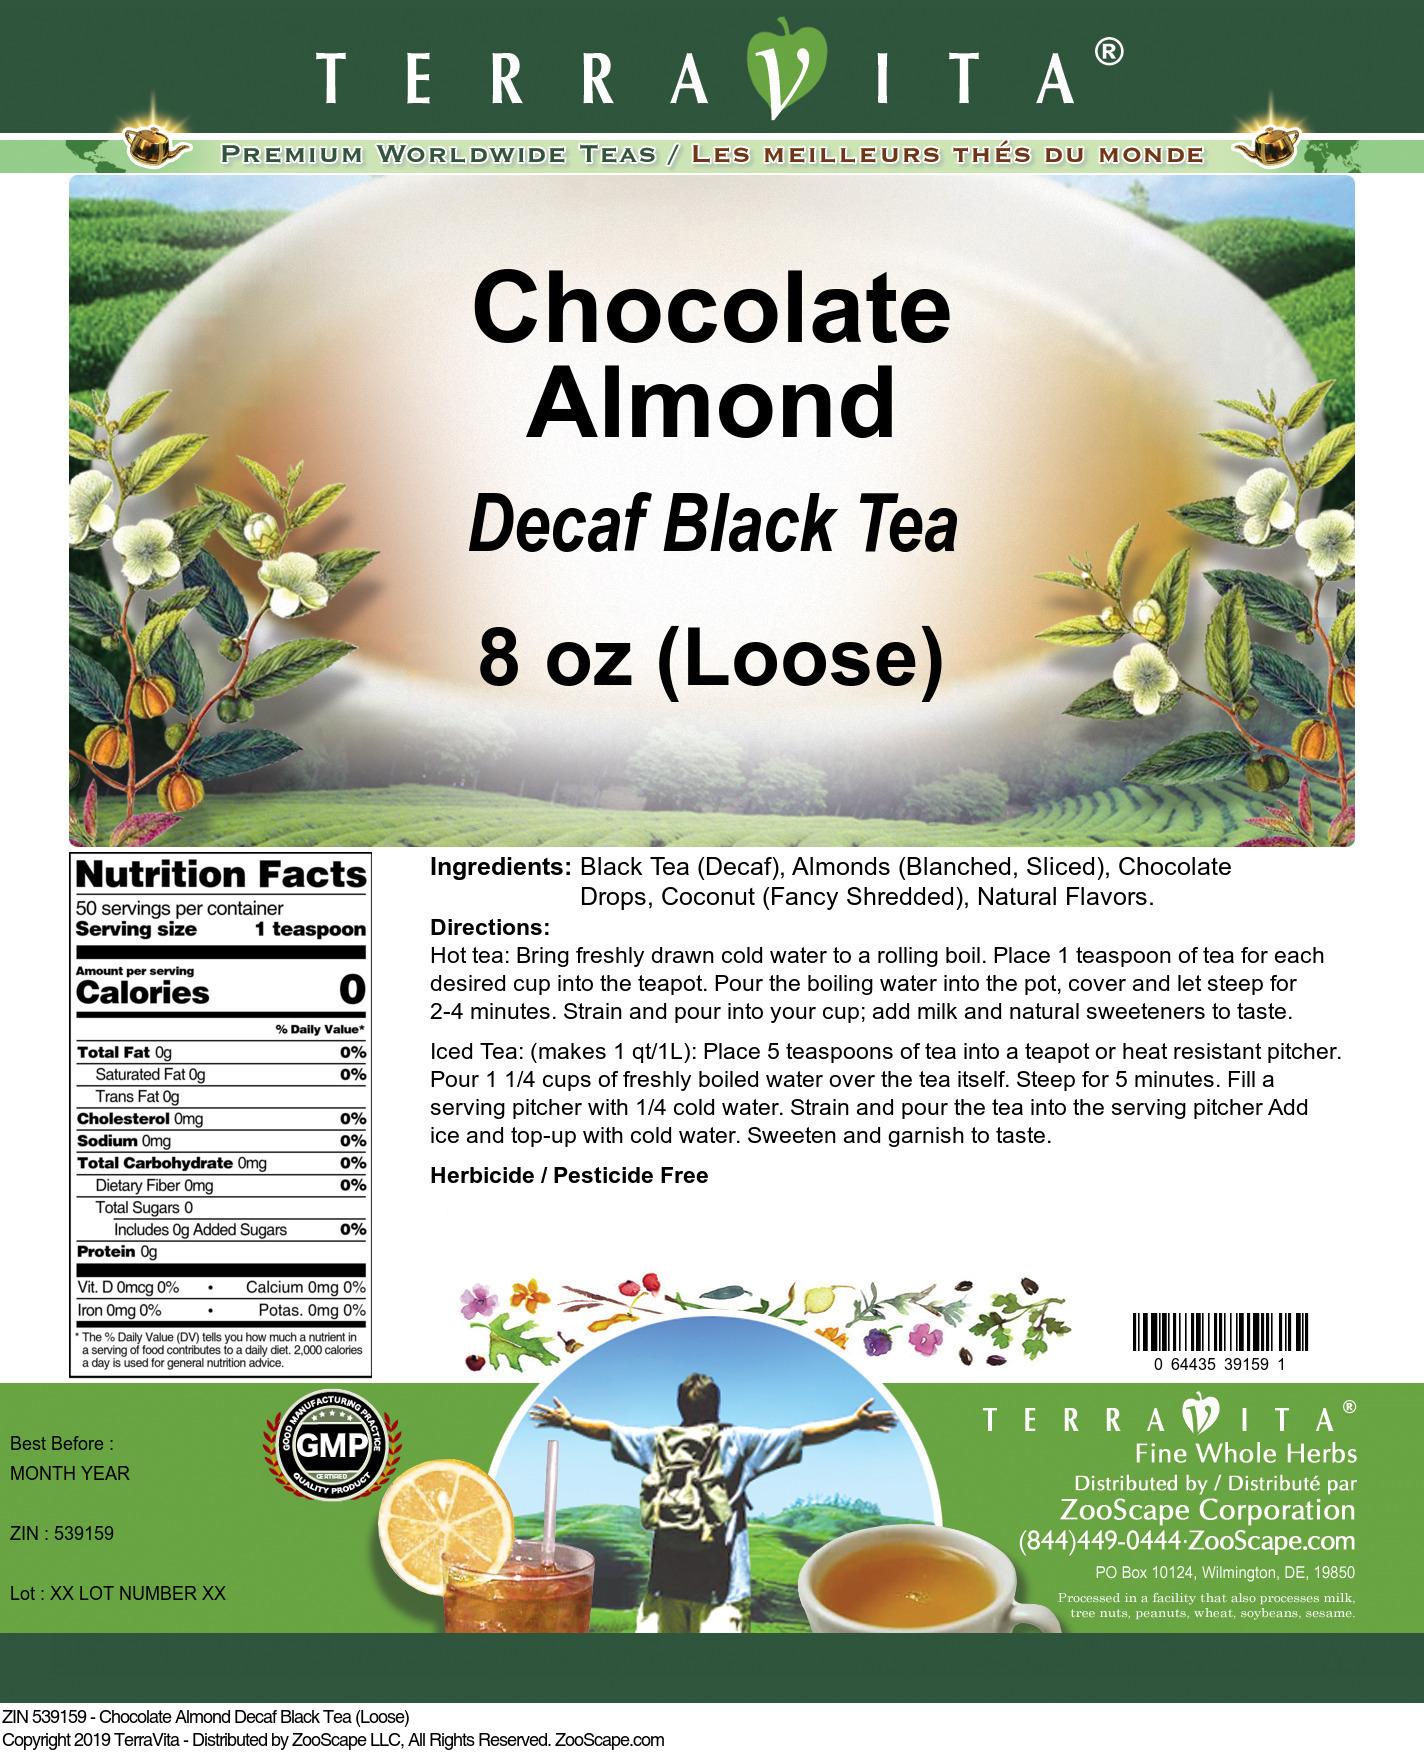 Chocolate Almond Decaf Black Tea